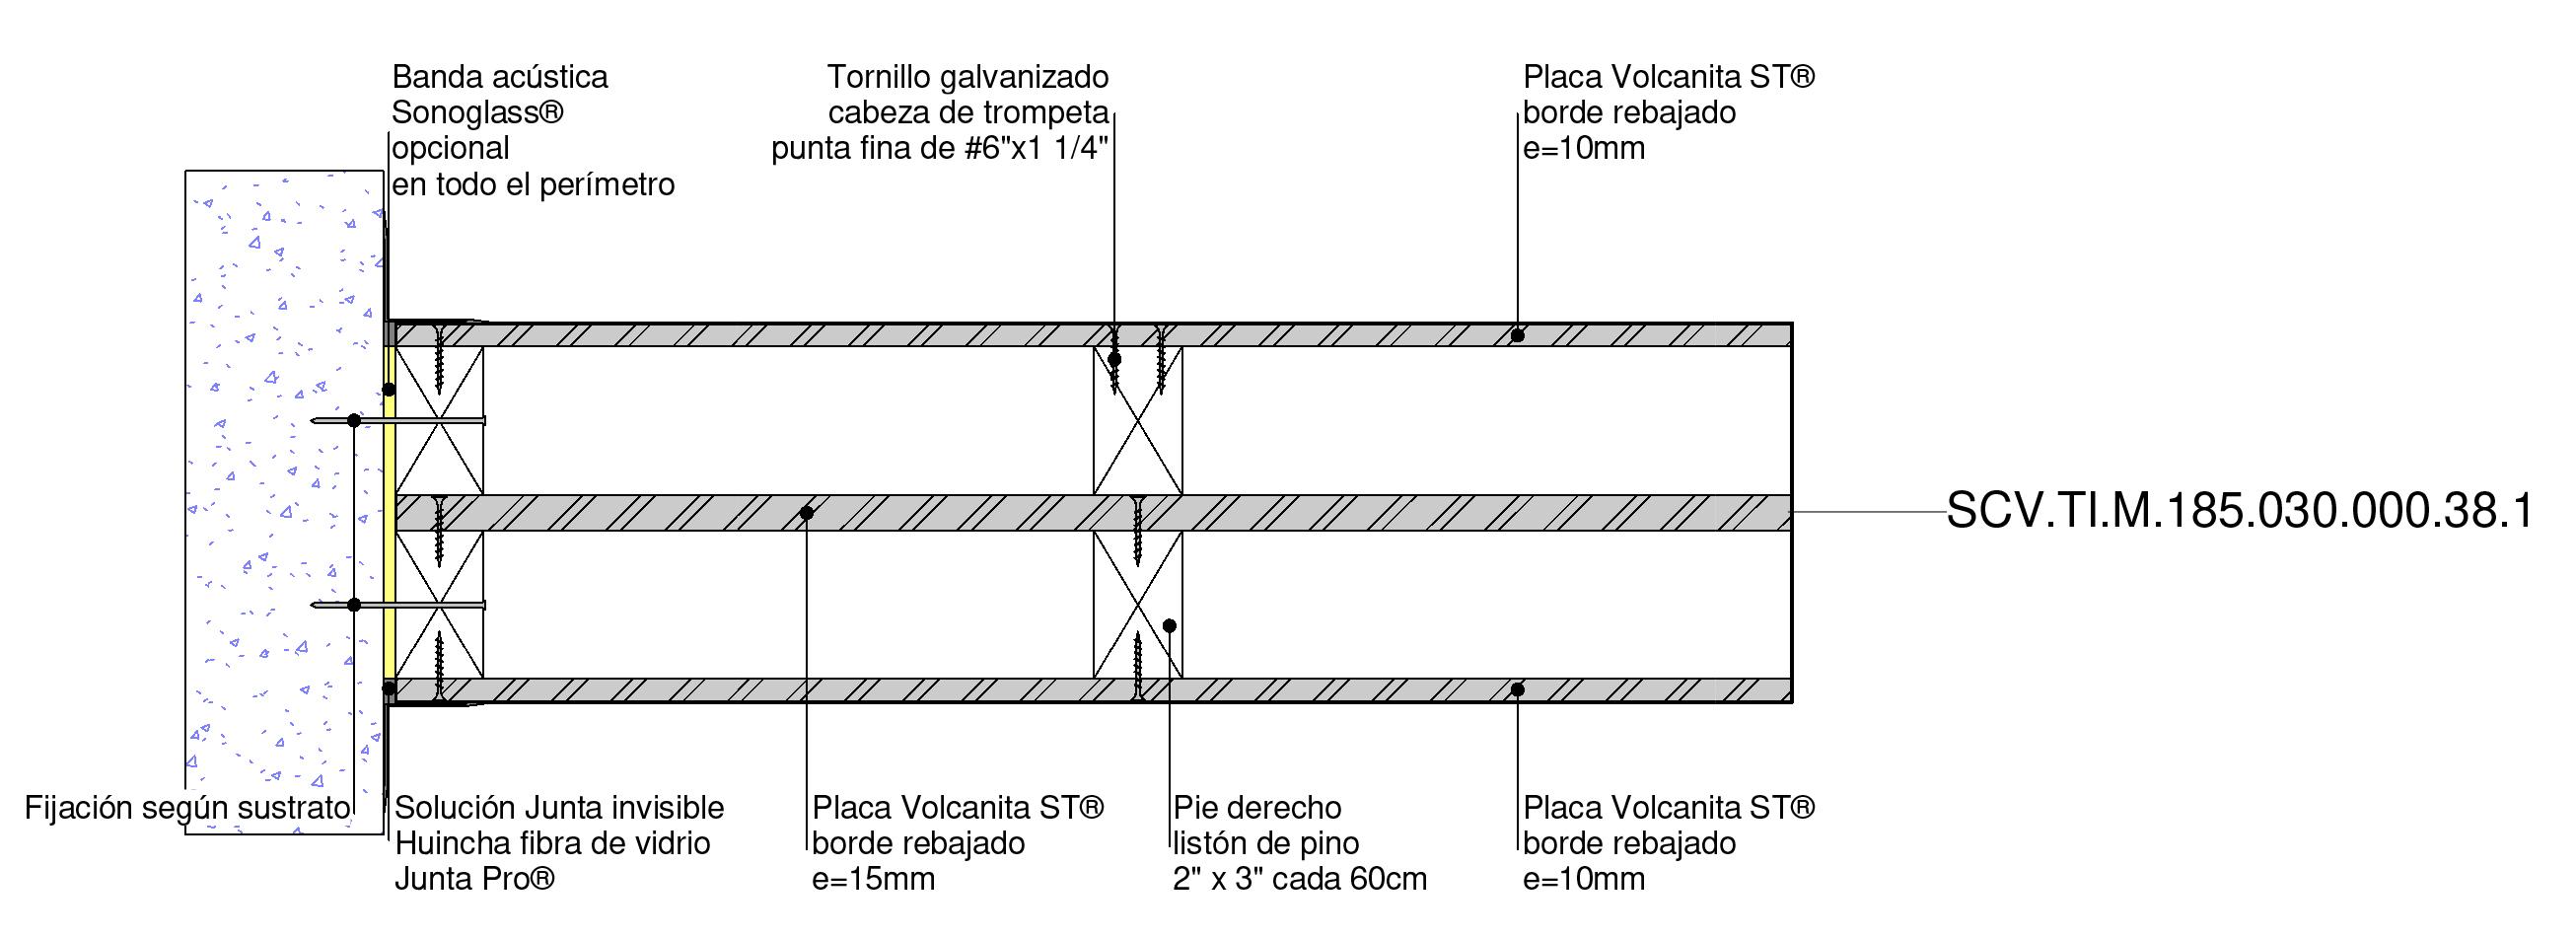 Tabique estructural F-30 de Volcan en BIM. Solución en rvt, ifc, dwg, para revit, BIM, de Volcan